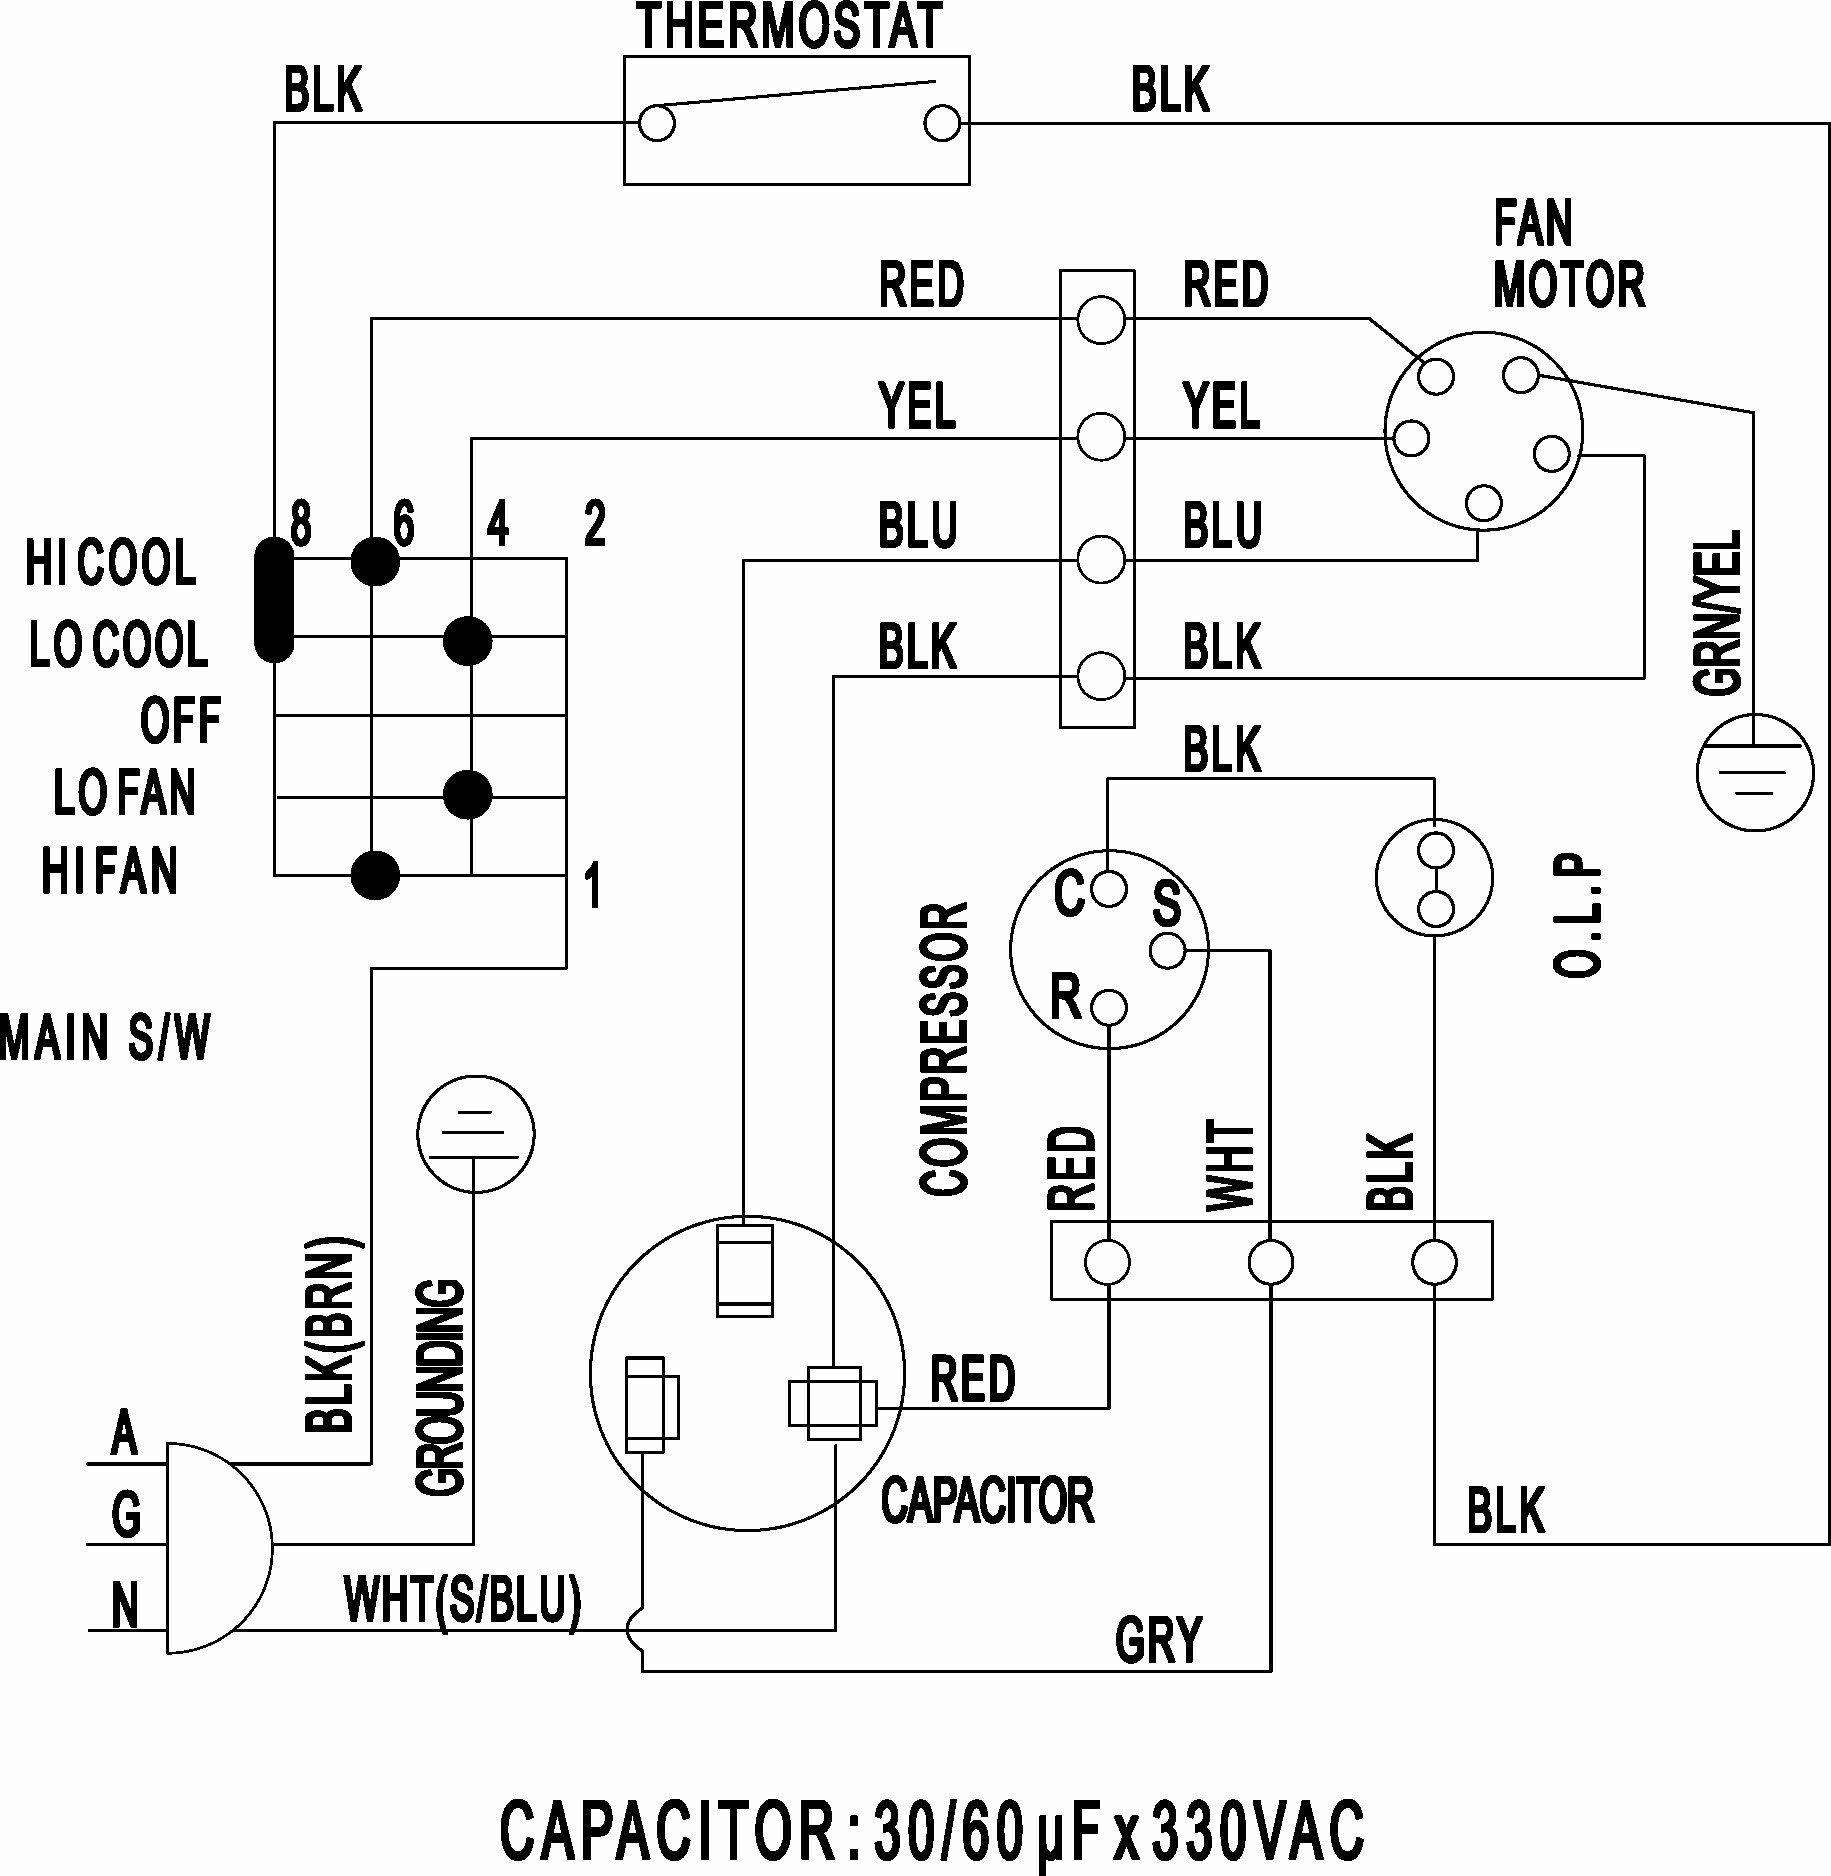 Wiring Diagram Symbols Chart Split Air Conditioner Wiring Diagram Hvac  Condenser Wiring Diagram Fres | Hvac Condenser Wiring Schematic |  | Pinterest